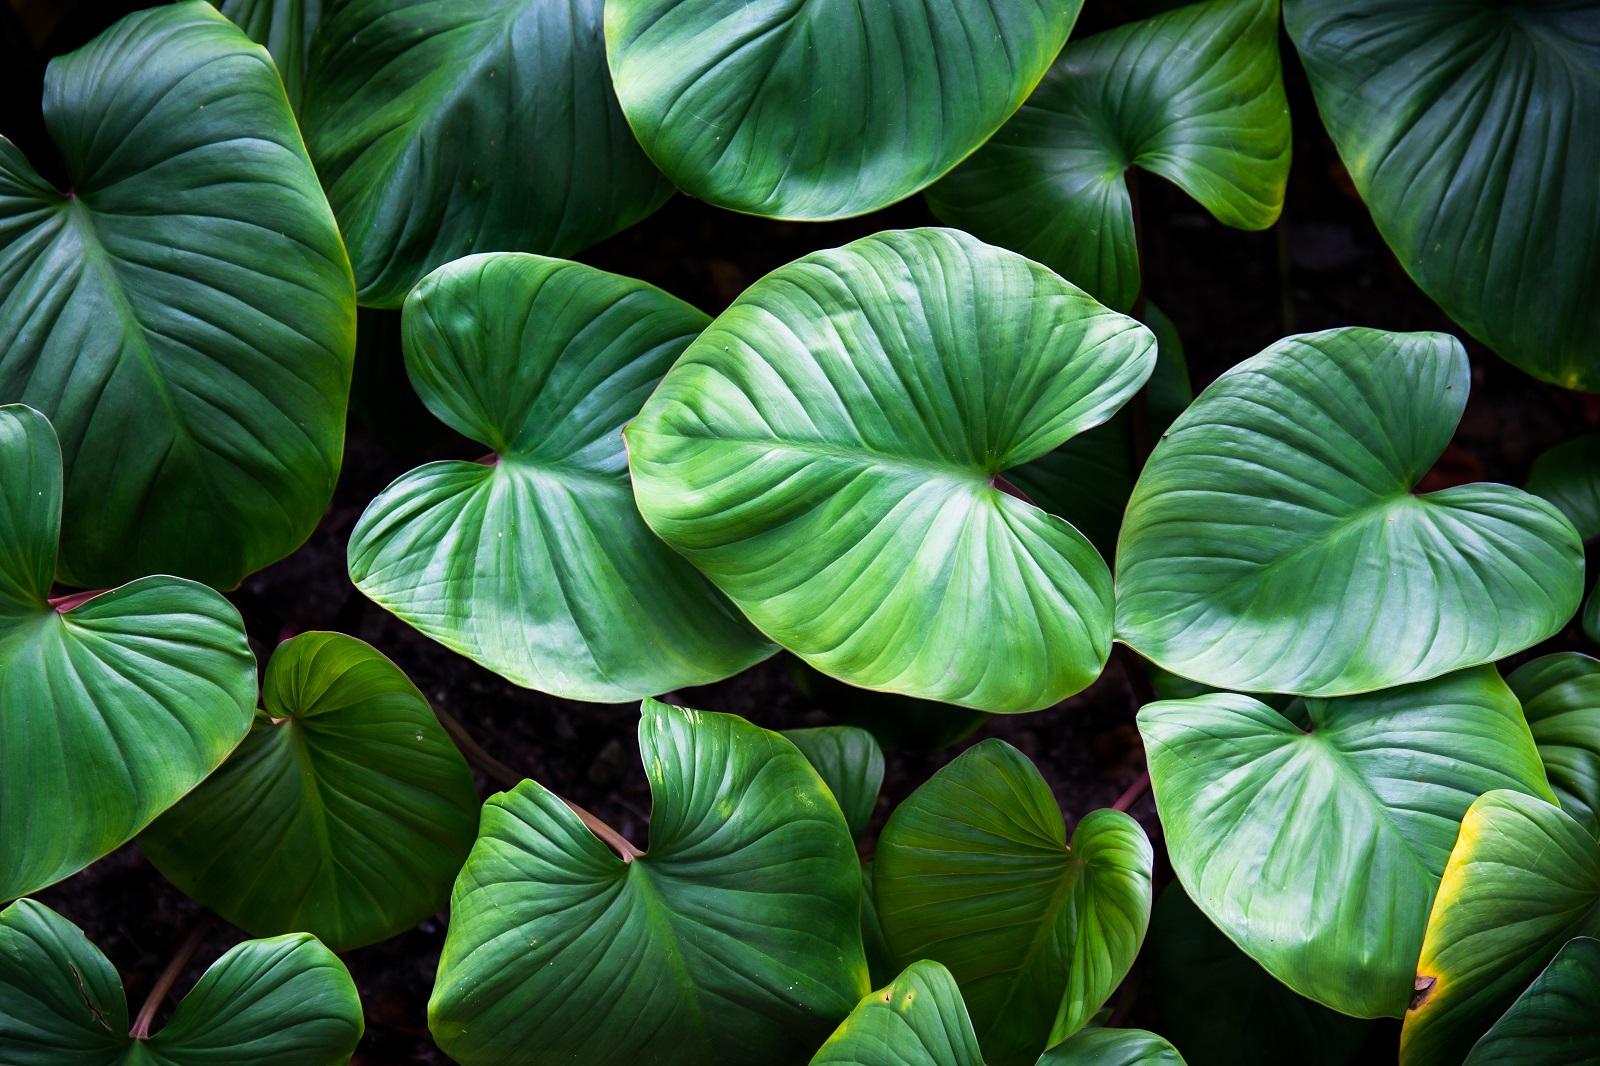 Cuidados paras plantas de interior perfeitas